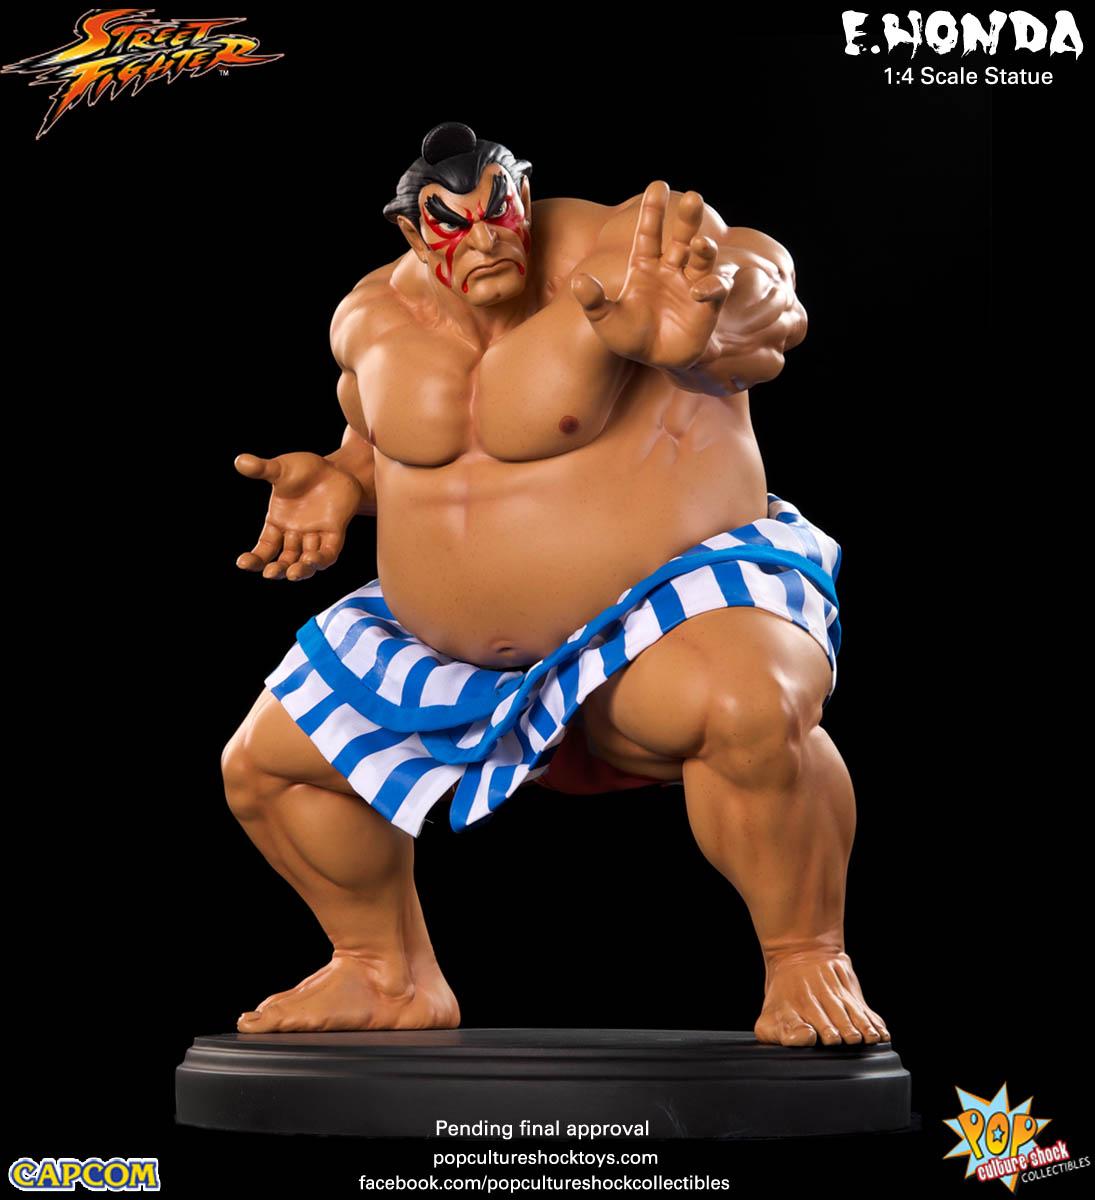 [Pop Culture Shock] Street Fighter: E. Honda 1/4 Statue - Página 3 Street-Fighter-E.-Honda-Regular-Statue-013